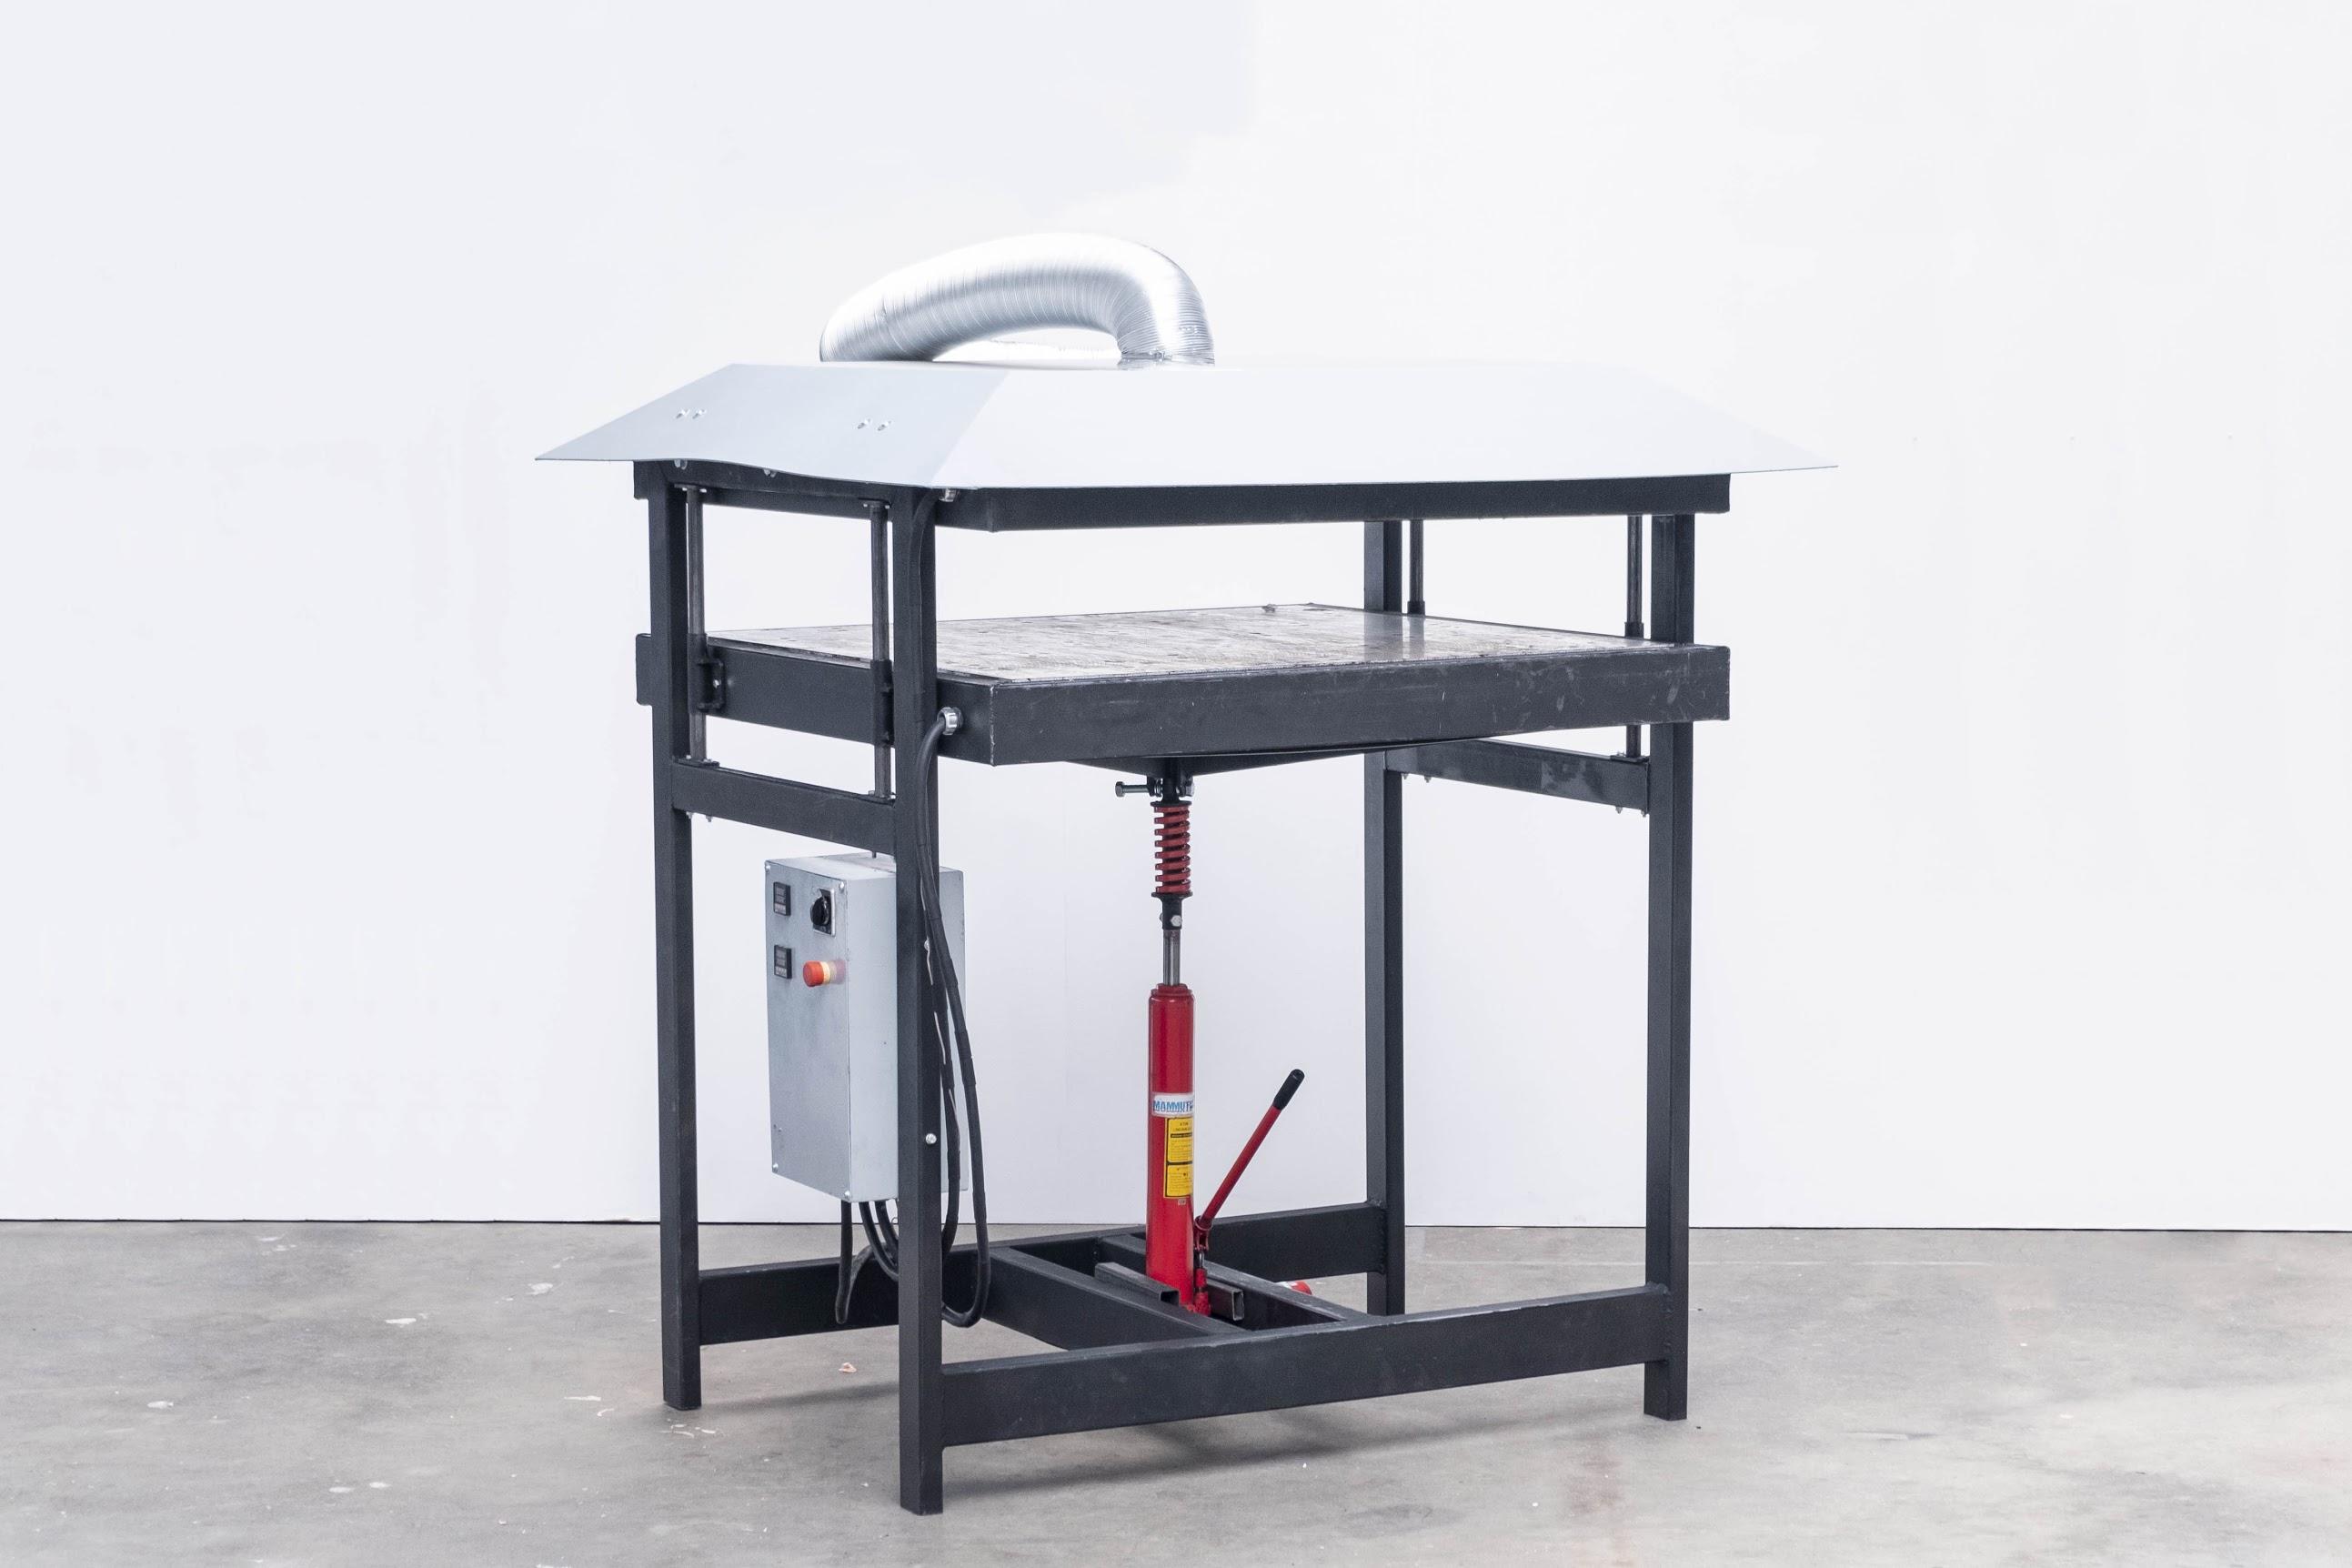 Precious Plastic sheetpress machine